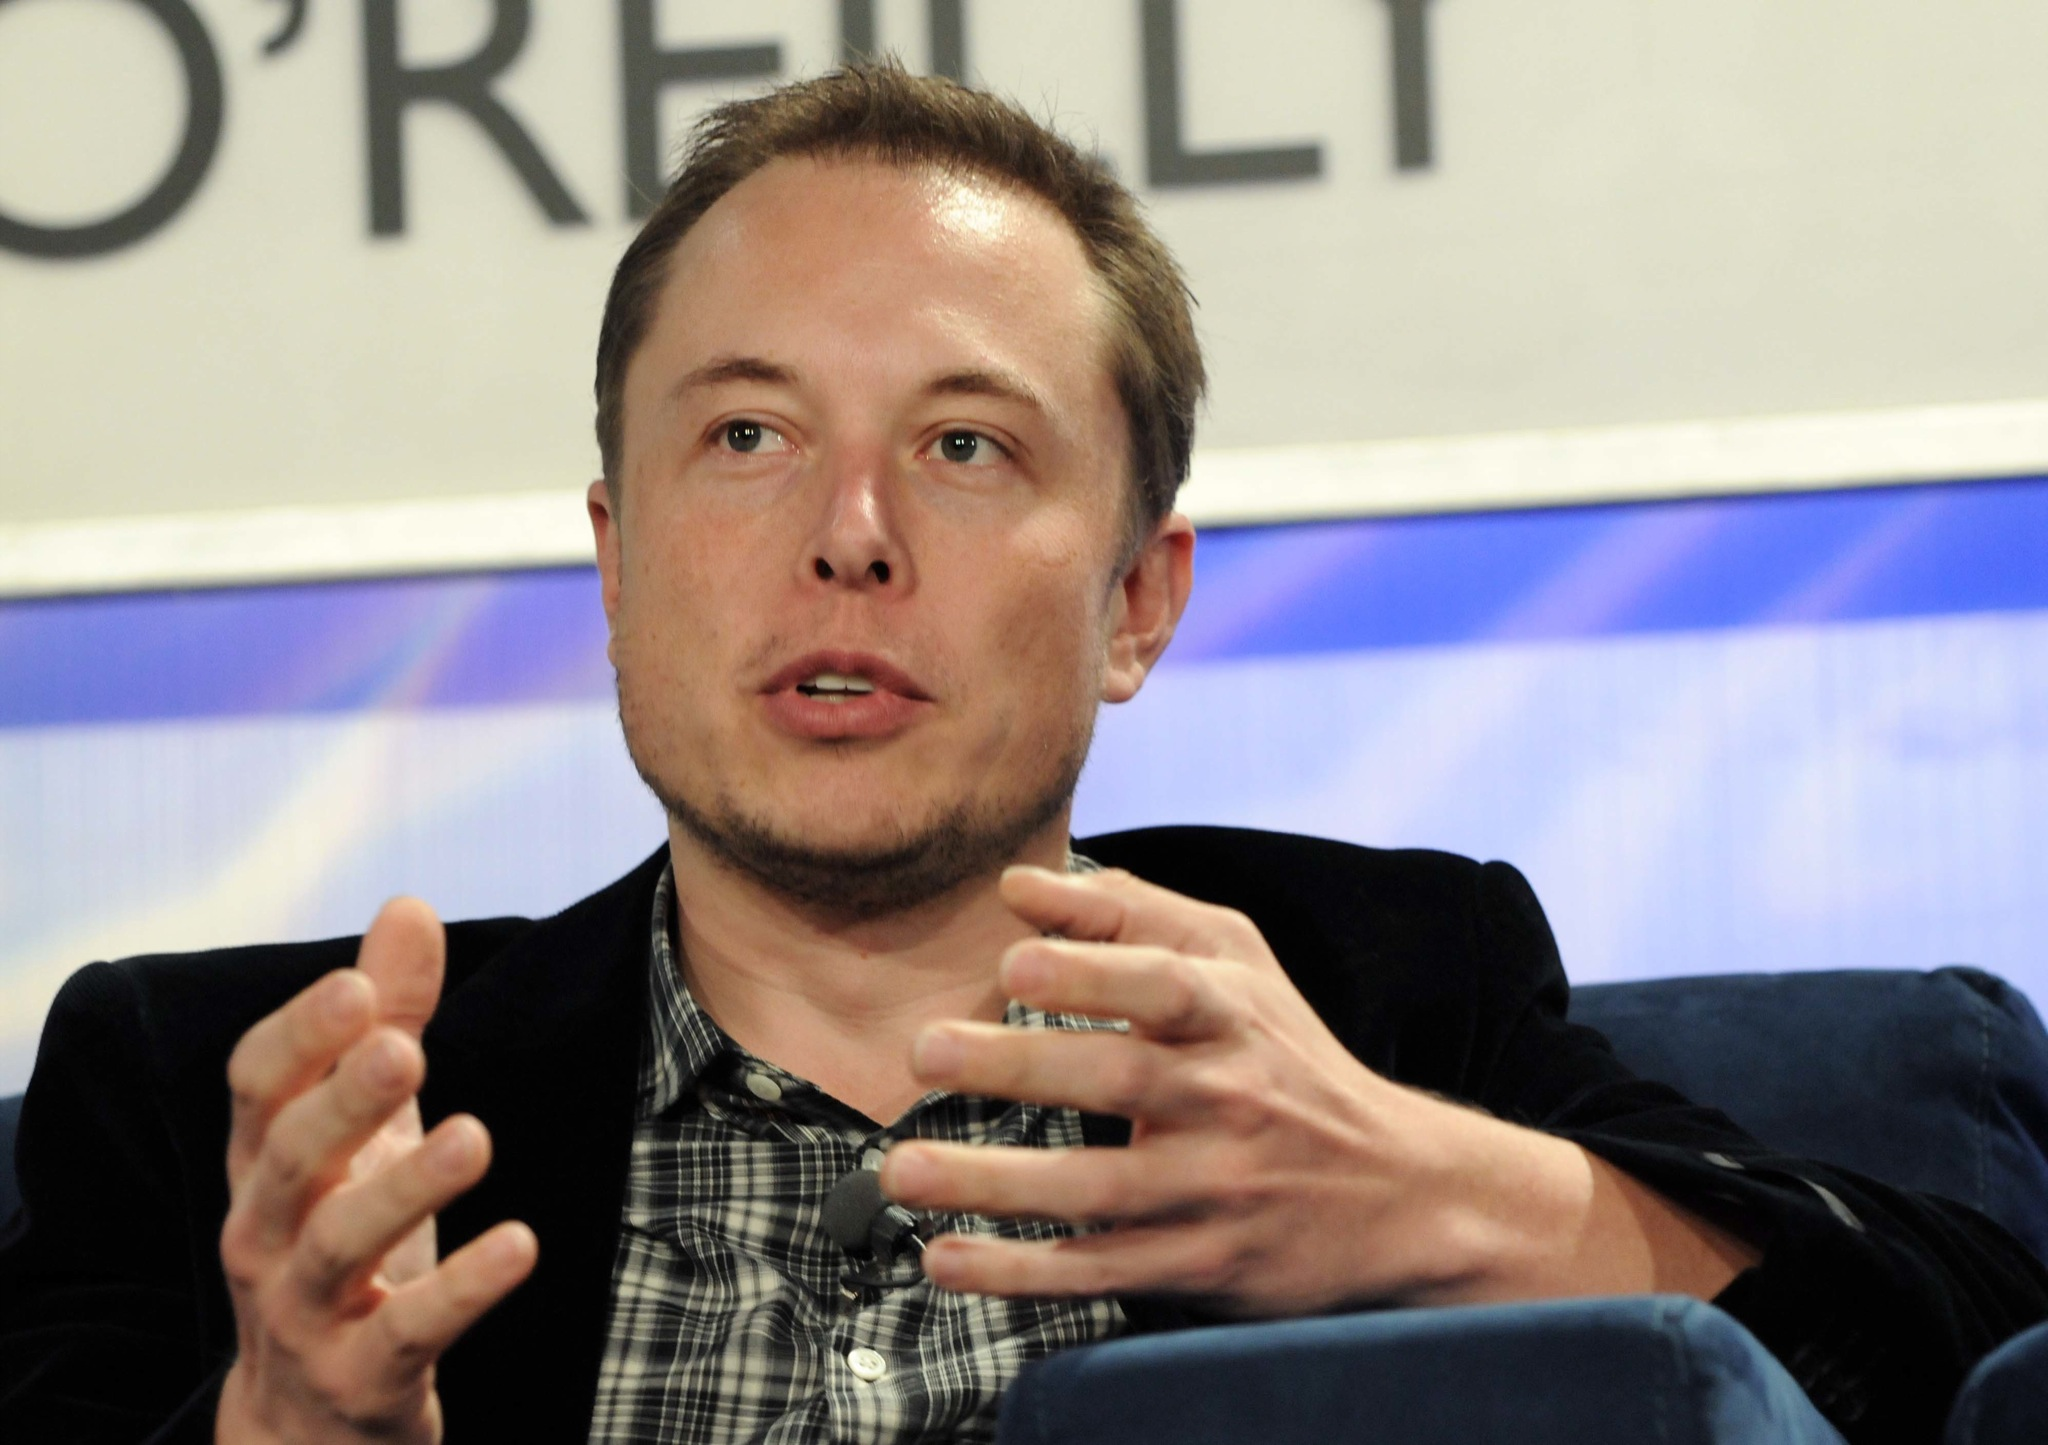 Elon Musk | Wikimedia Commons